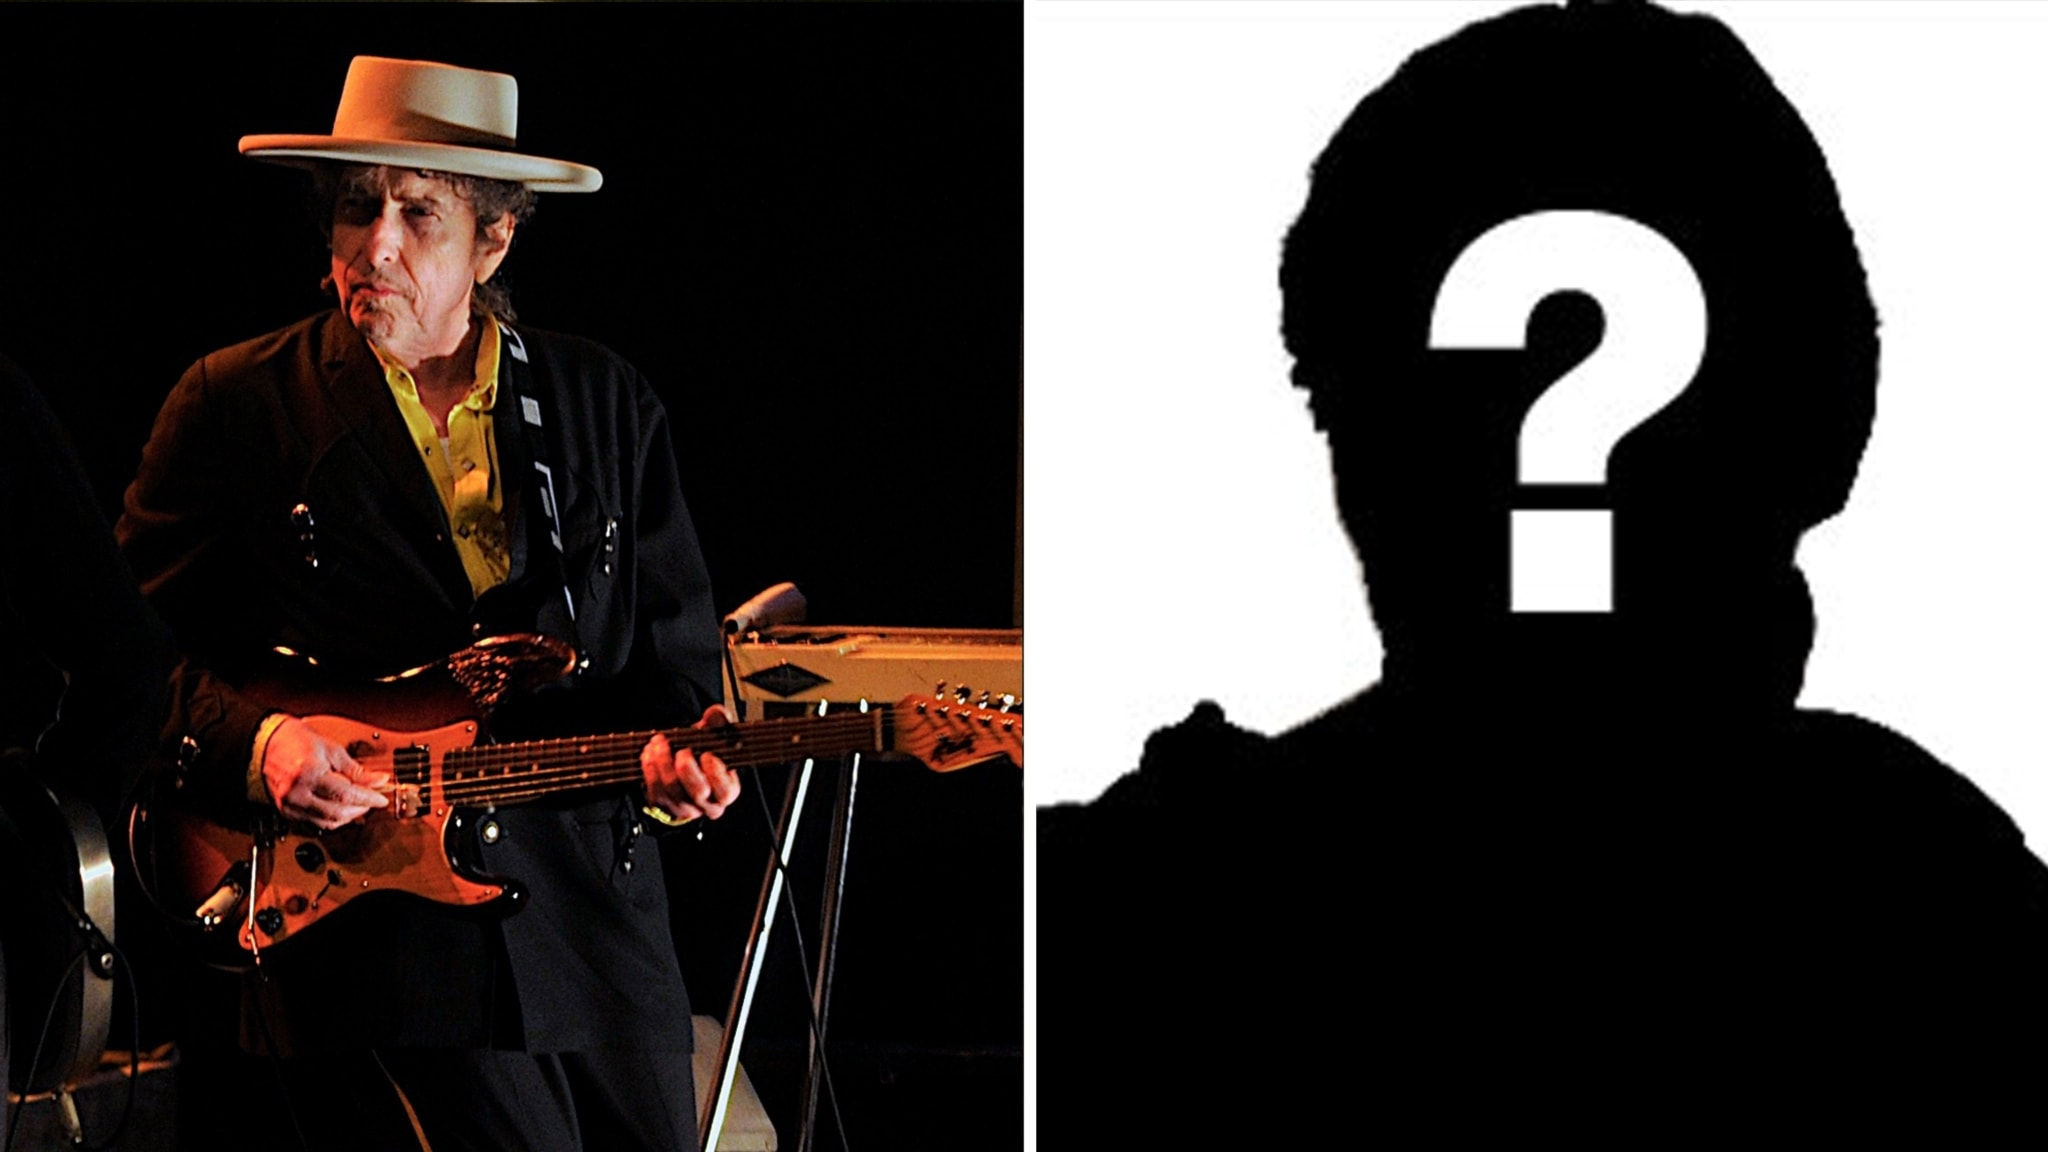 Efter Dylan - vem får årets Nobelpris i litteratur?